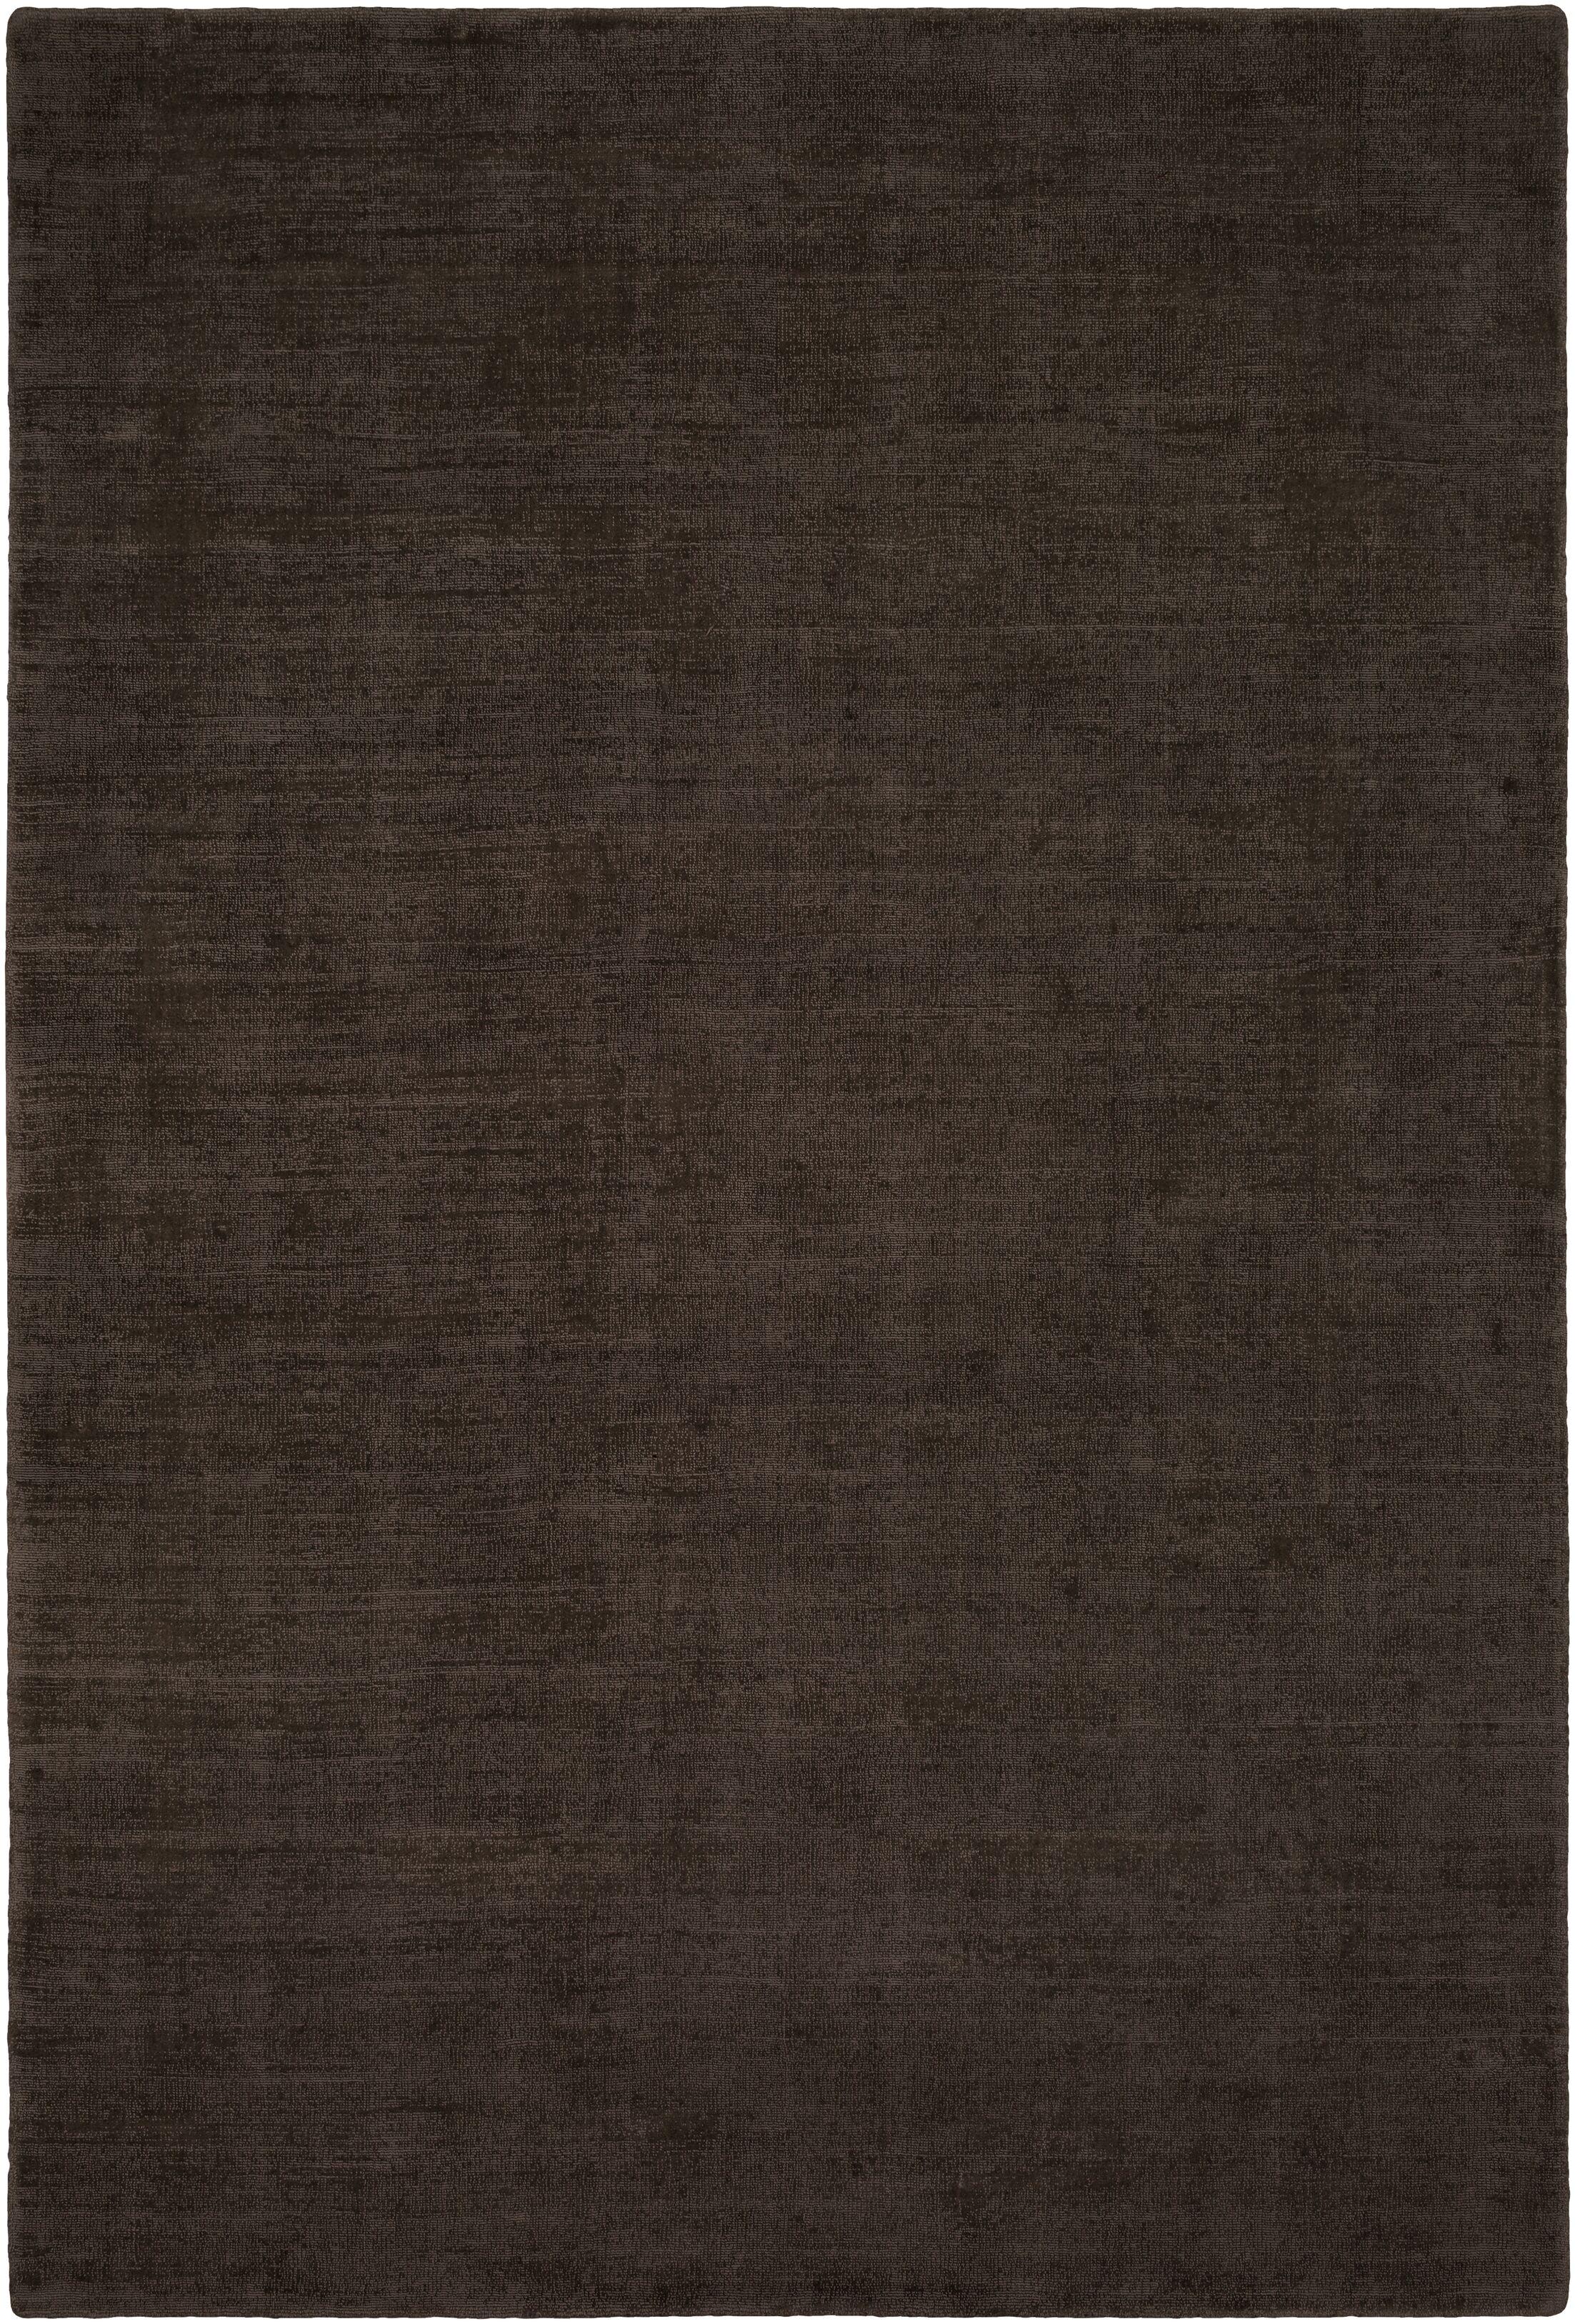 Laraine Hand-Loomed Black/Brown Area Rug Rug Size: Rectangle 6' x 9'